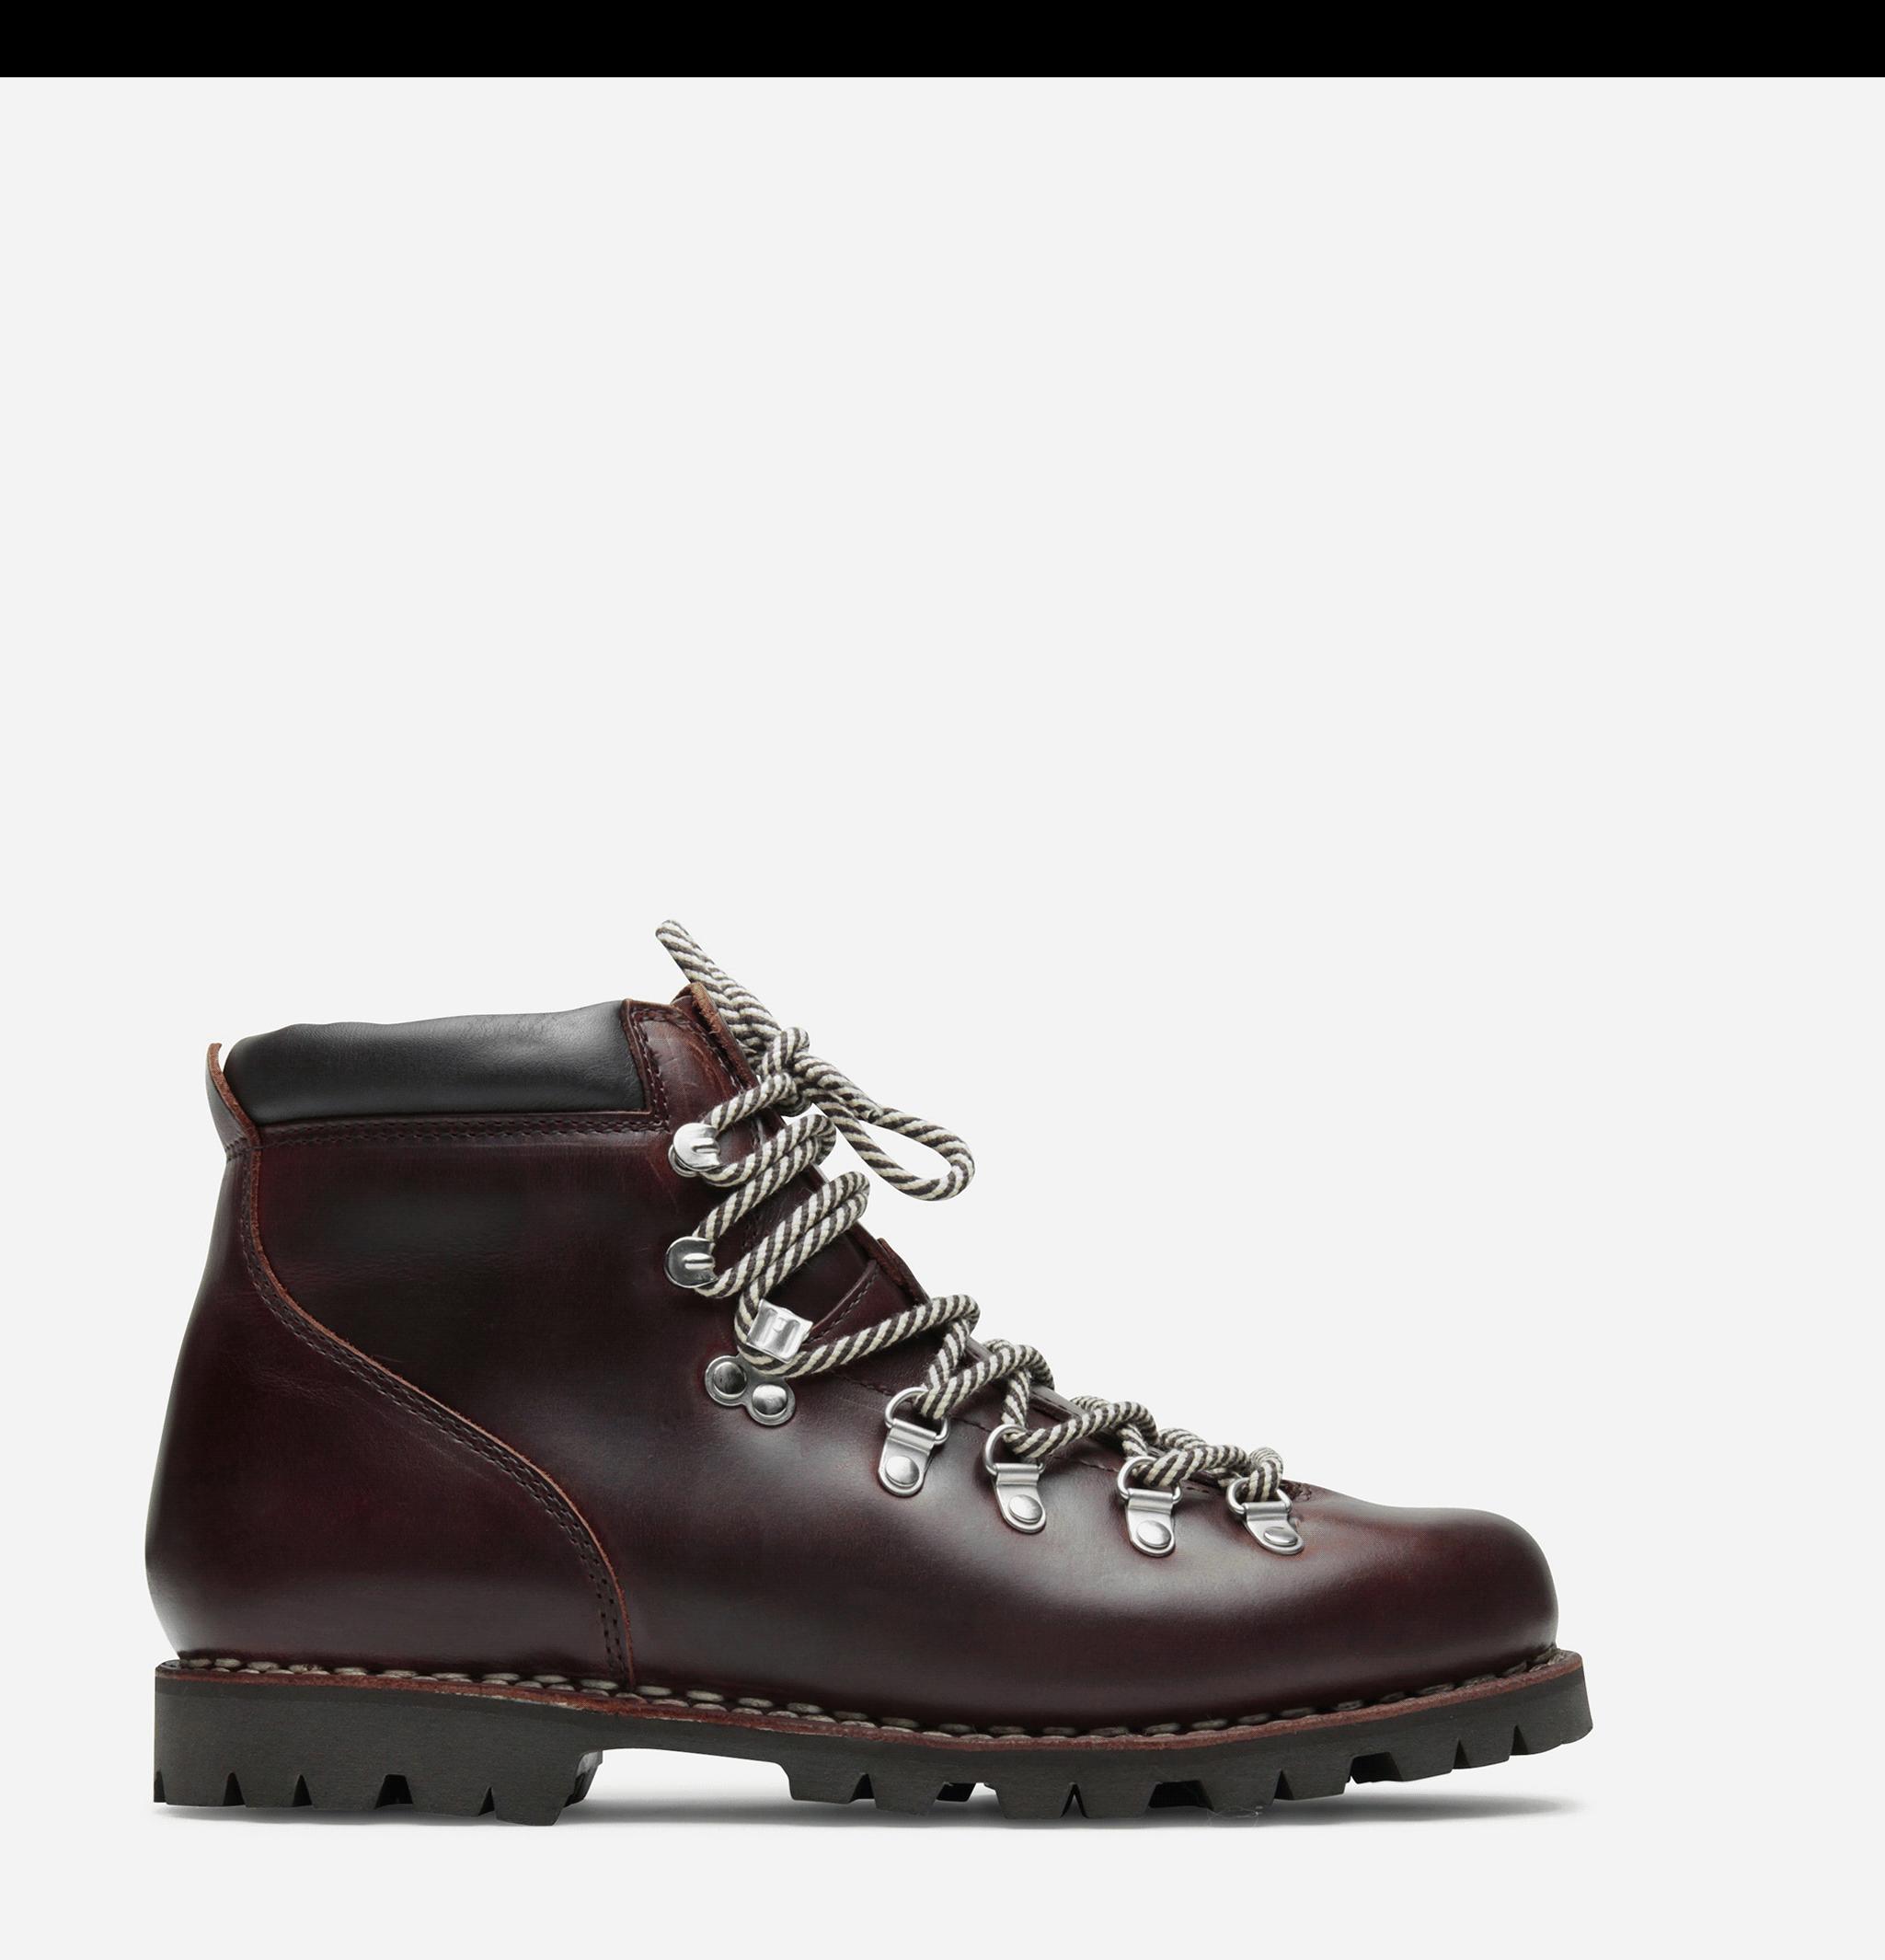 Boots Avoriaz Jannu Ecorce